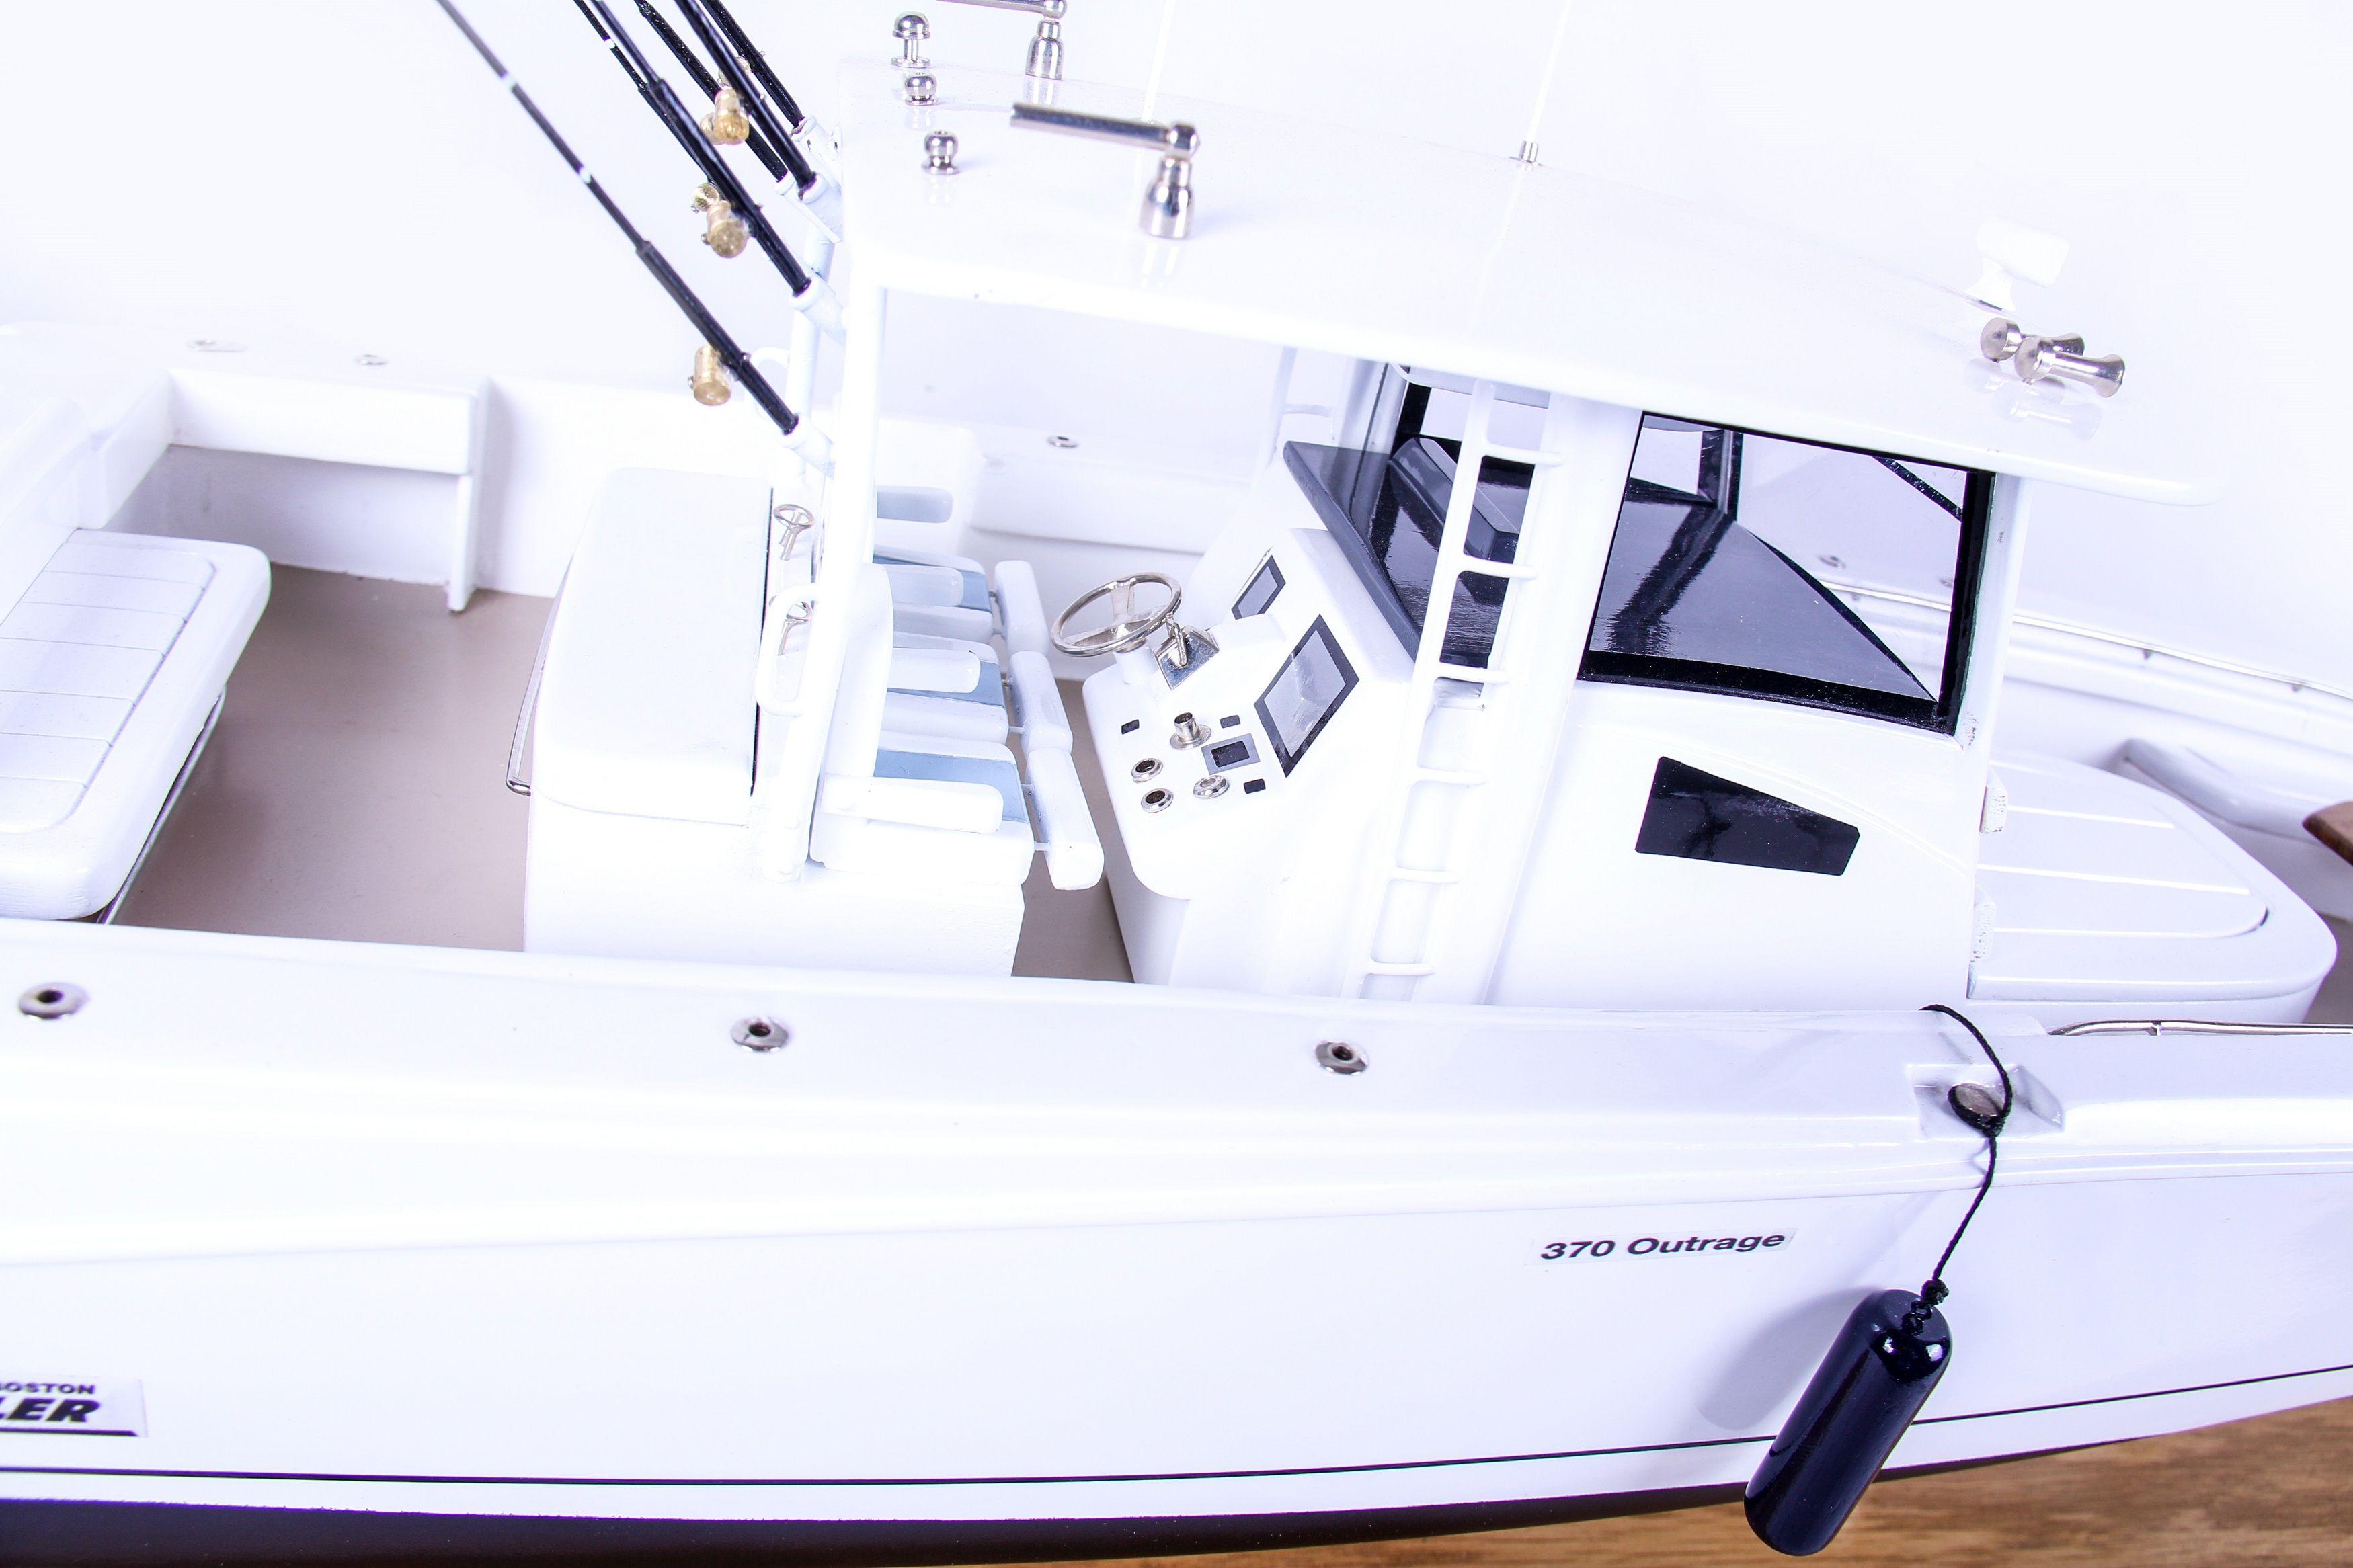 1686-9522-Boston-Whaler-Outrage-370-Model-Boat